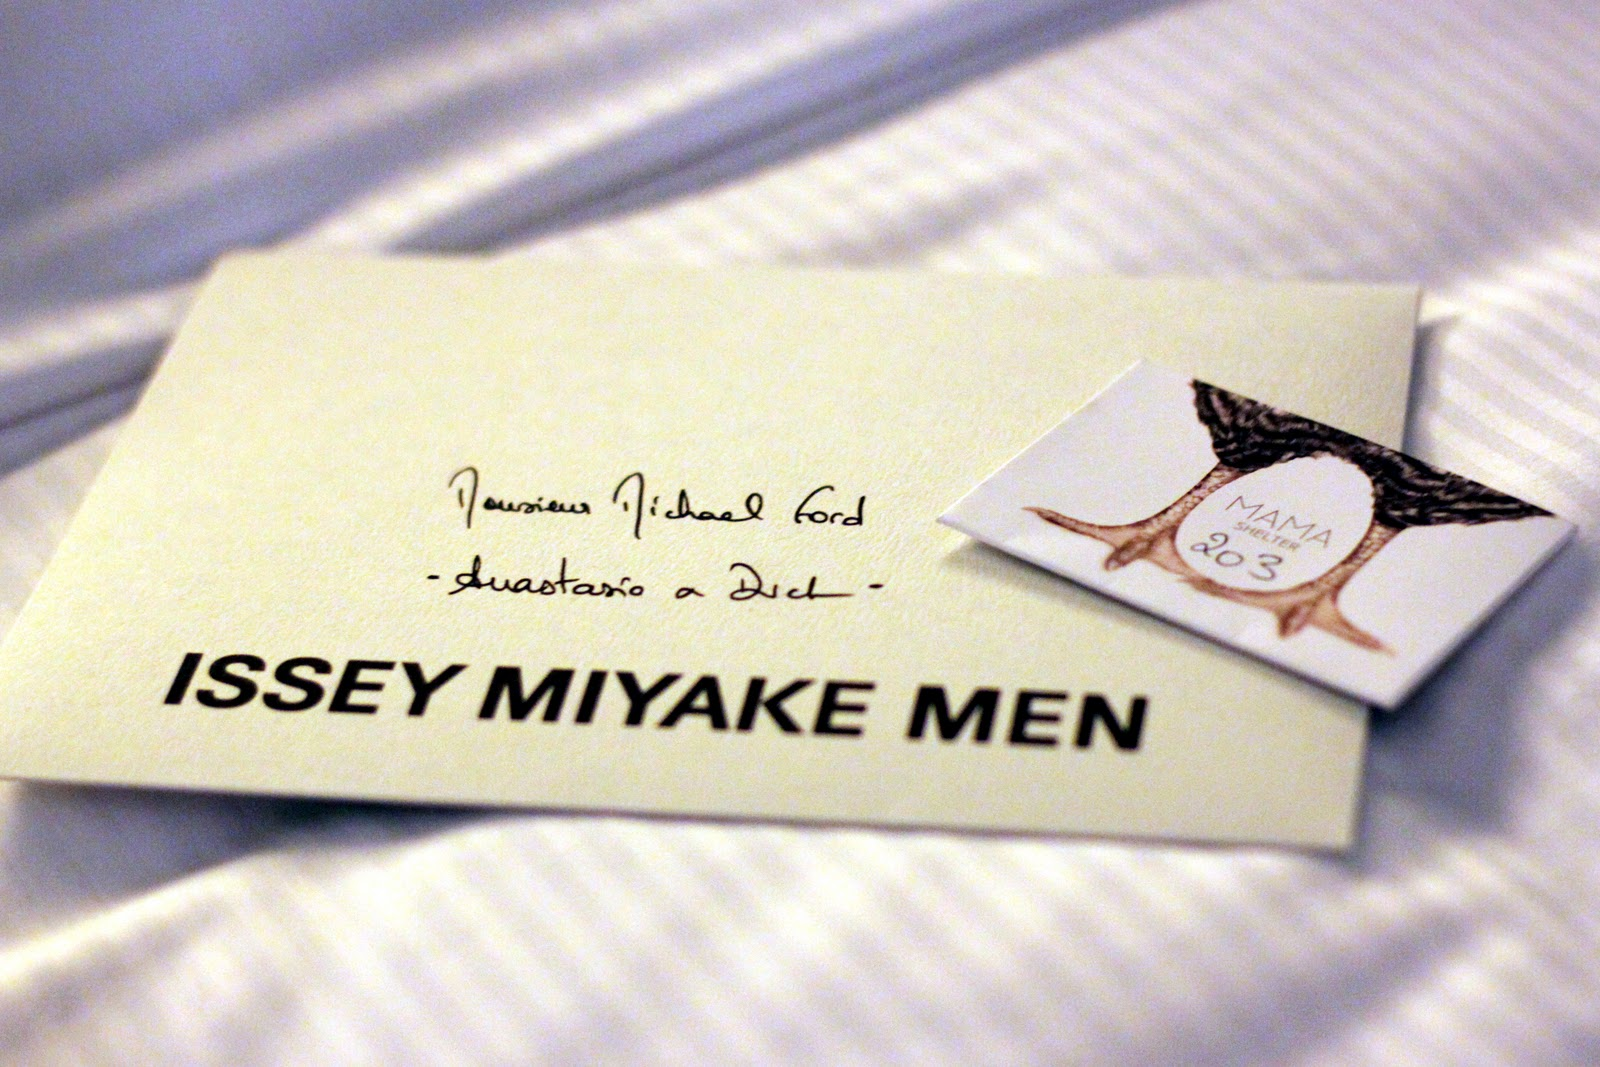 Issey Miyake menswear invitation